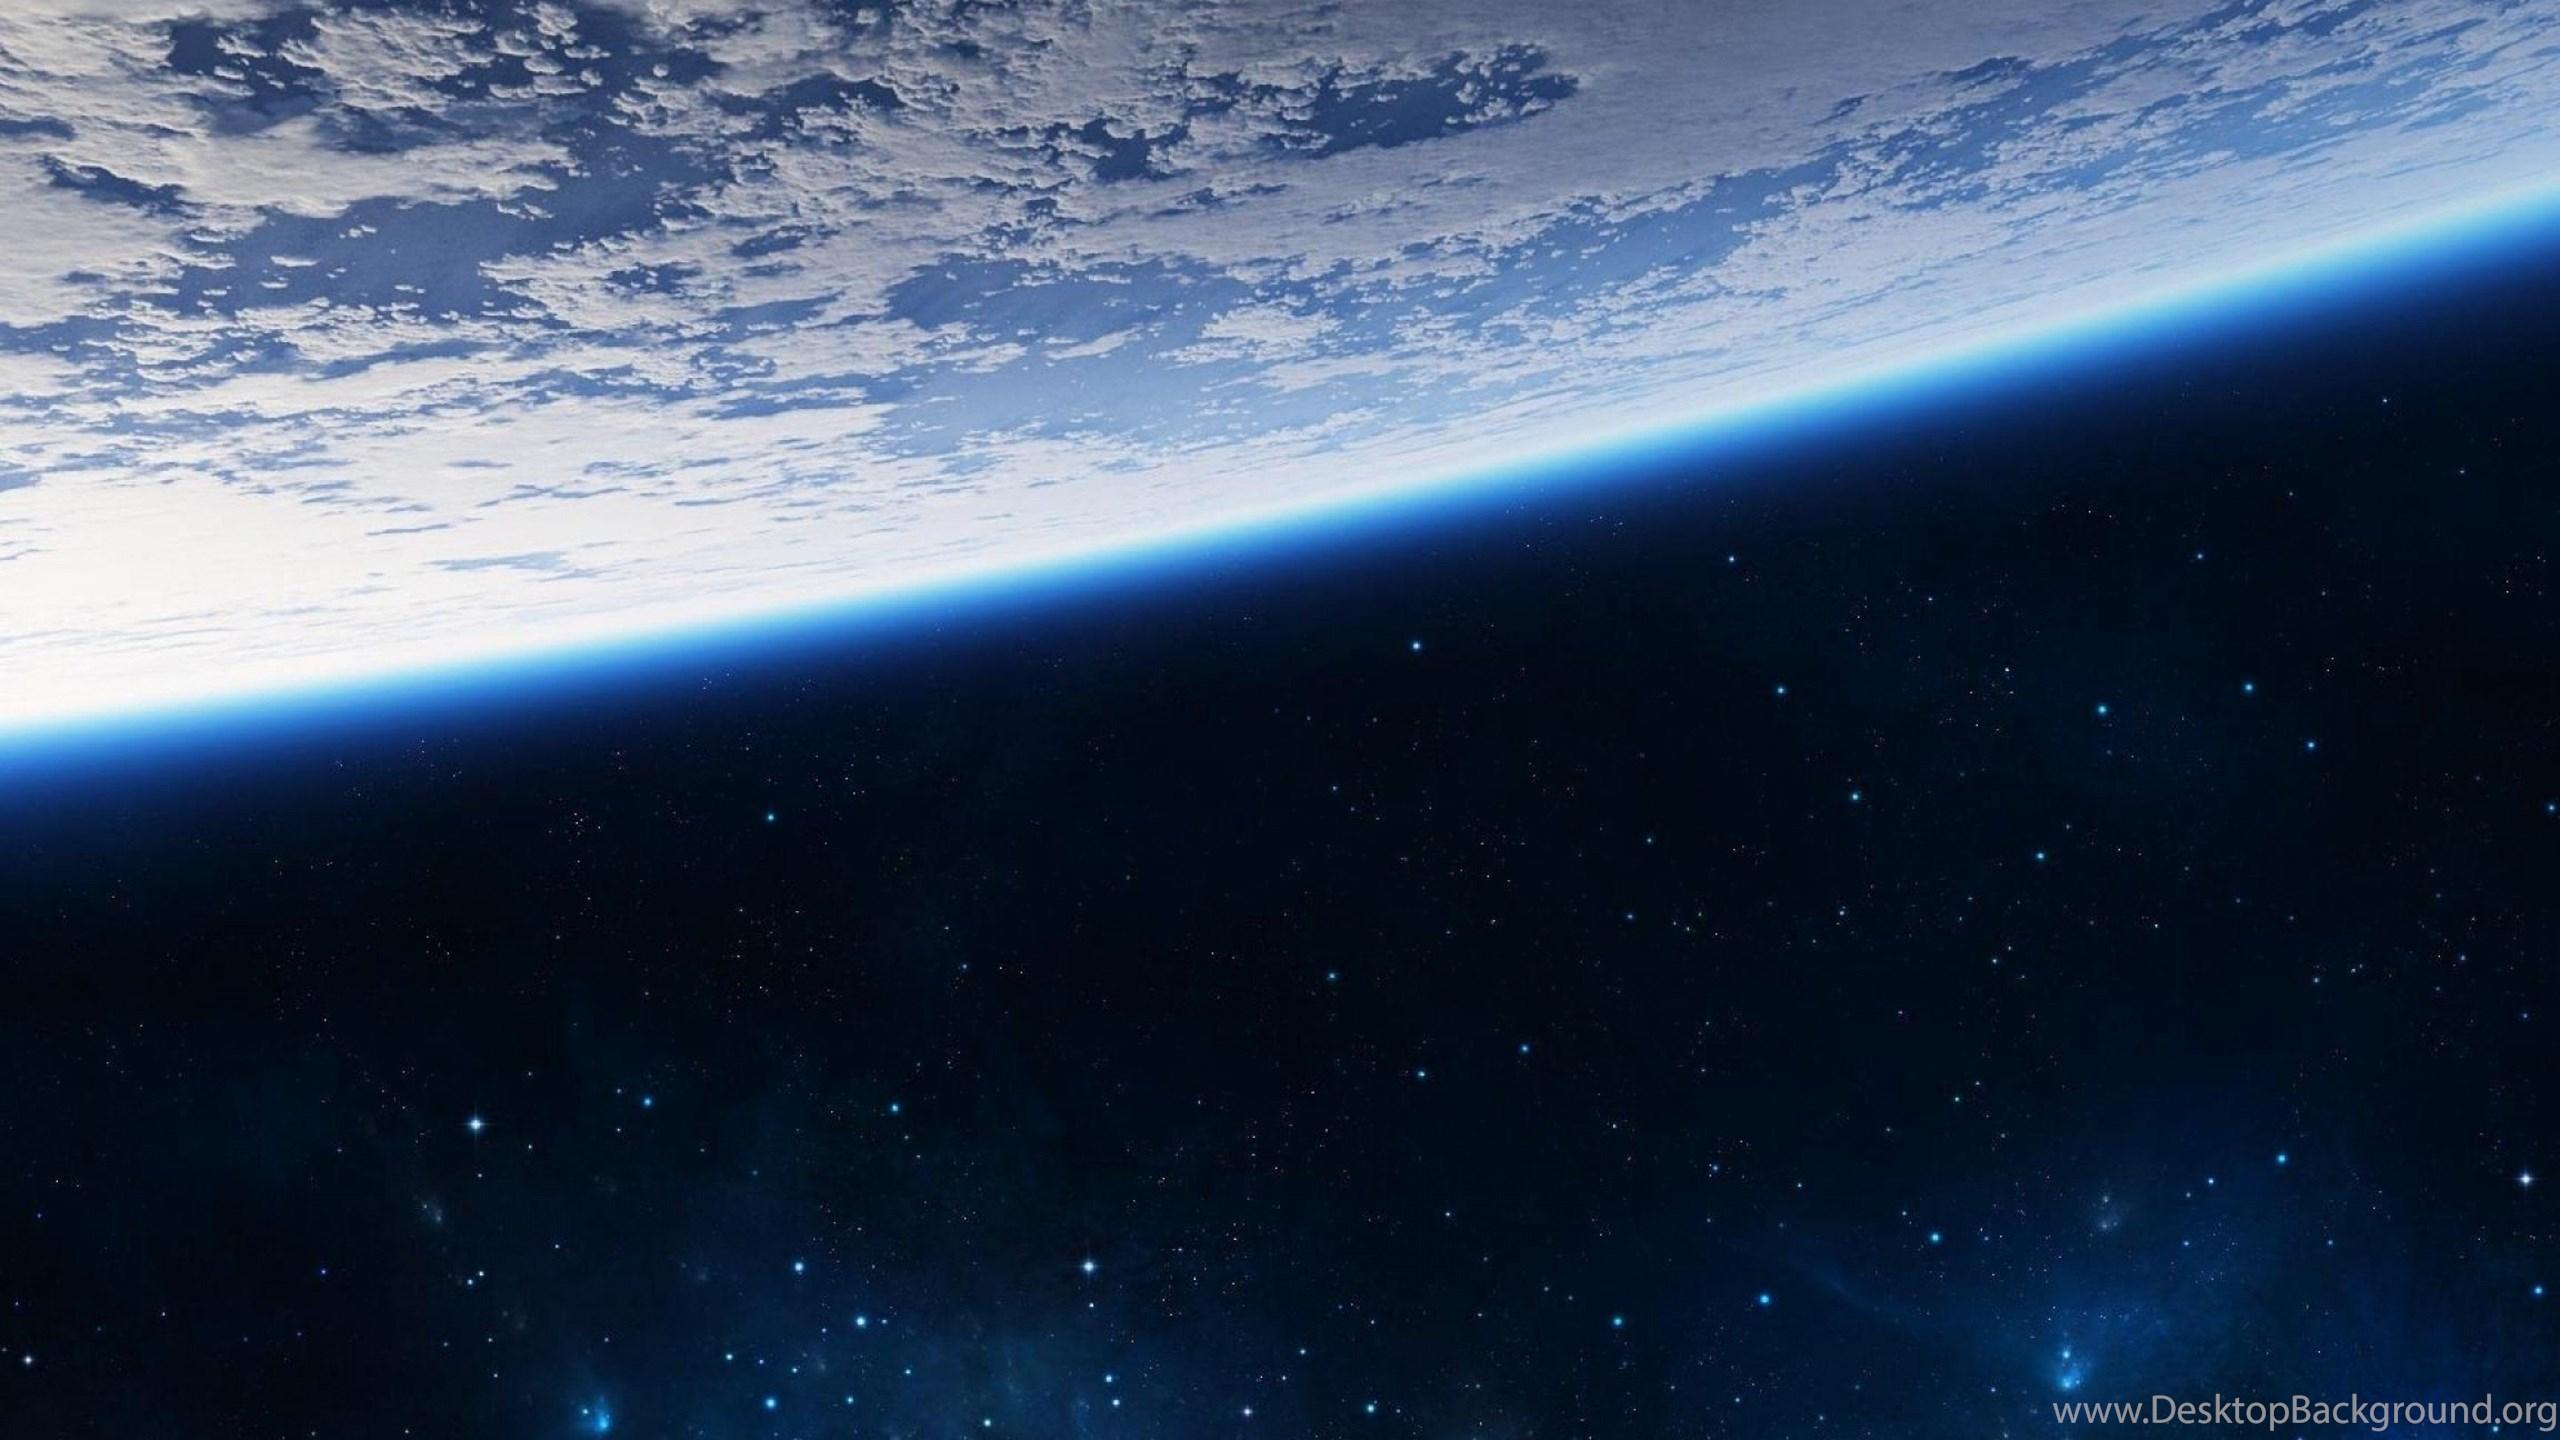 Space Earth Wallpaper Space Earth Hd Wallpaper Wallpapers Hd